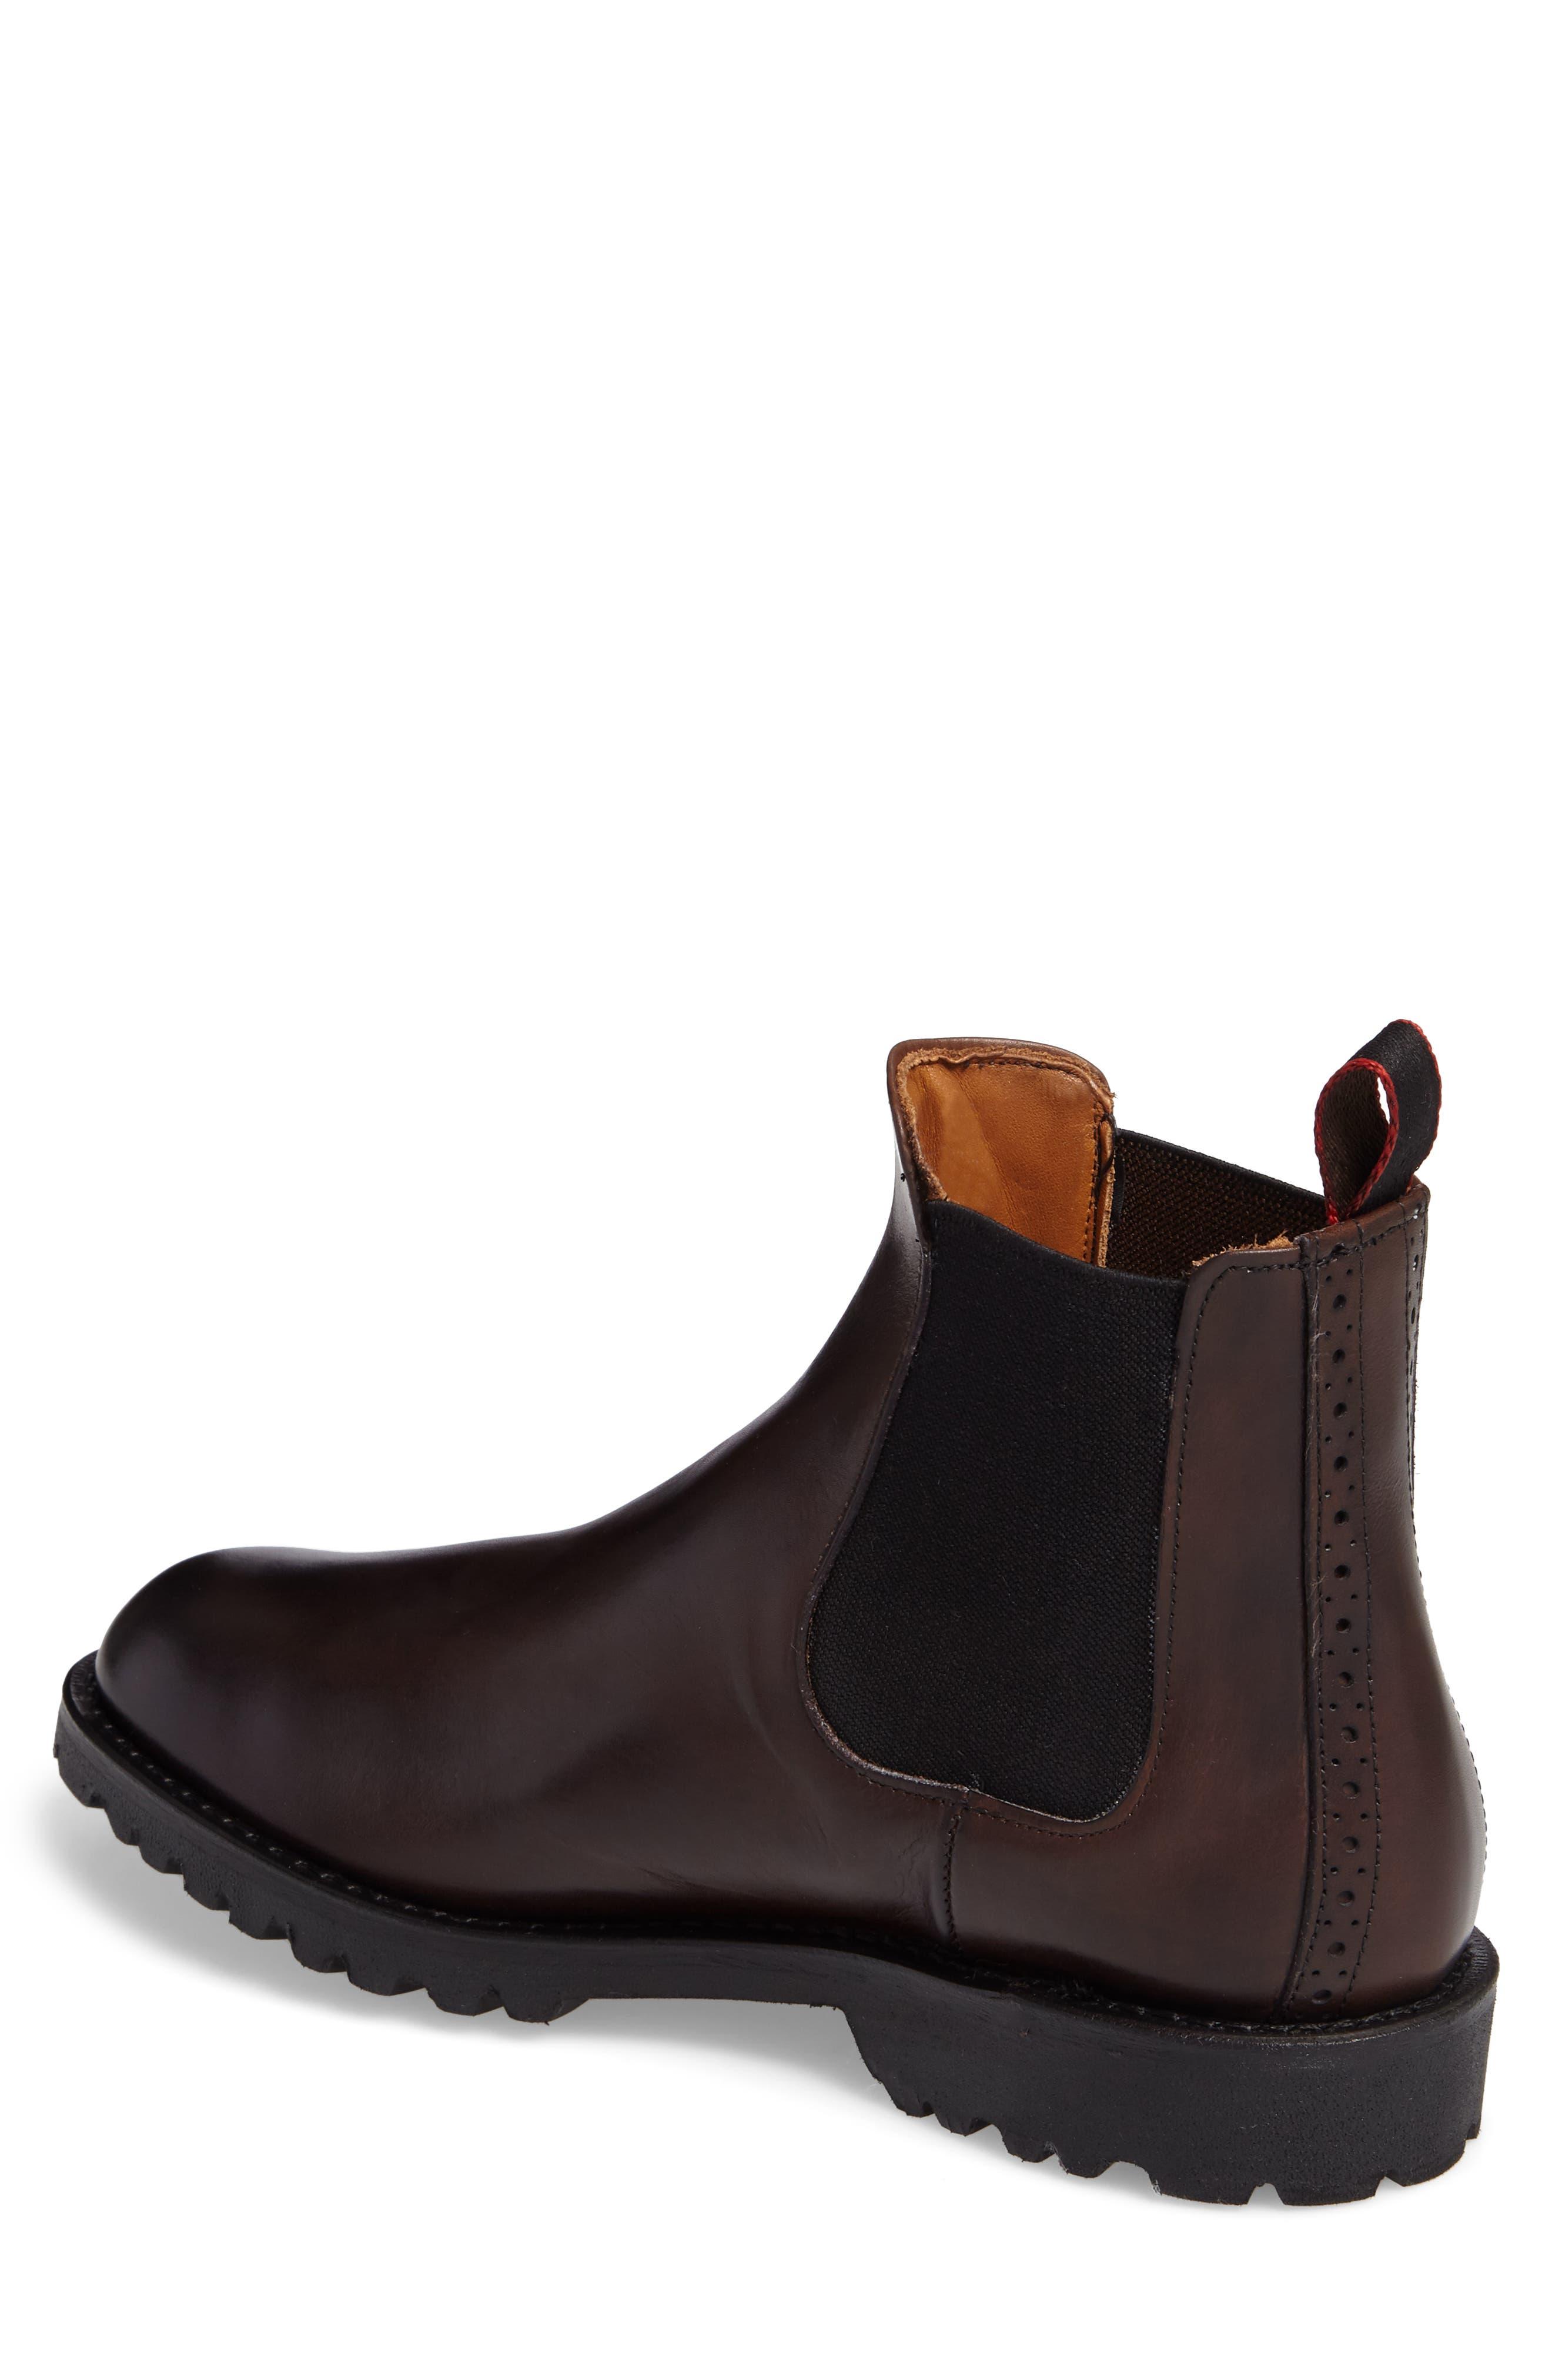 Alternate Image 2  - Allen Edmonds Tate Chelsea Boot (Men)